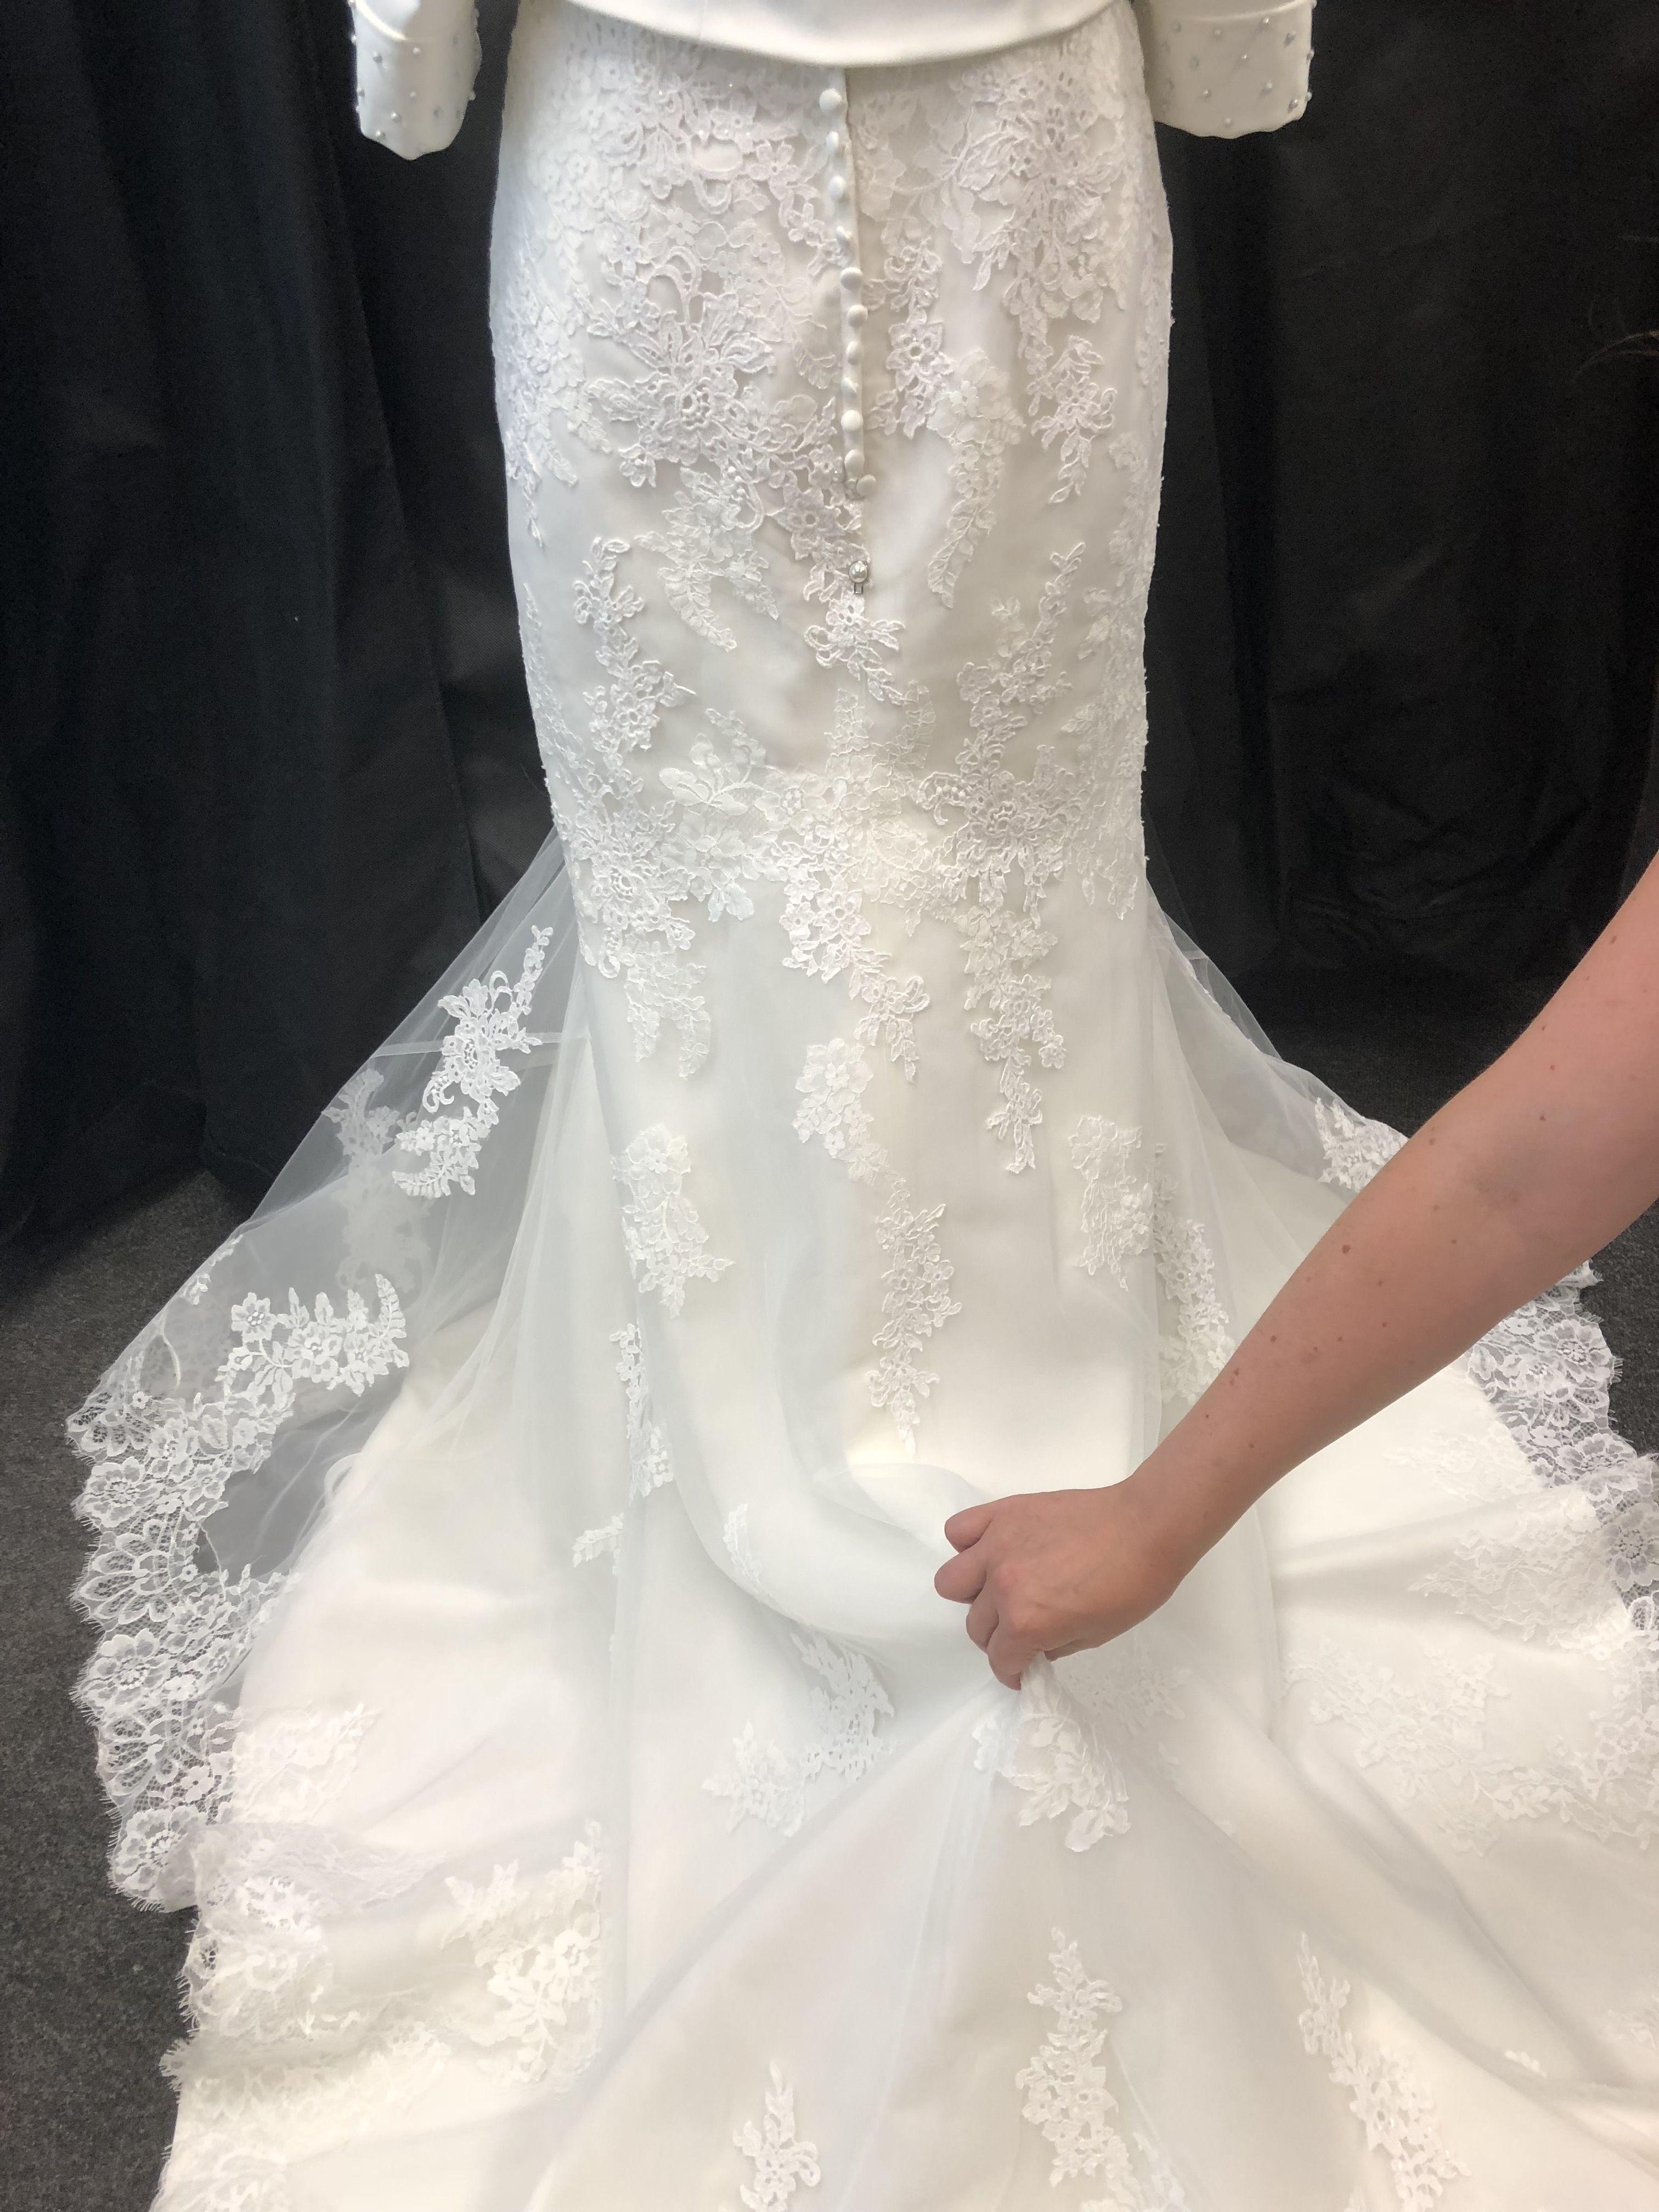 Wedding dress train hook up